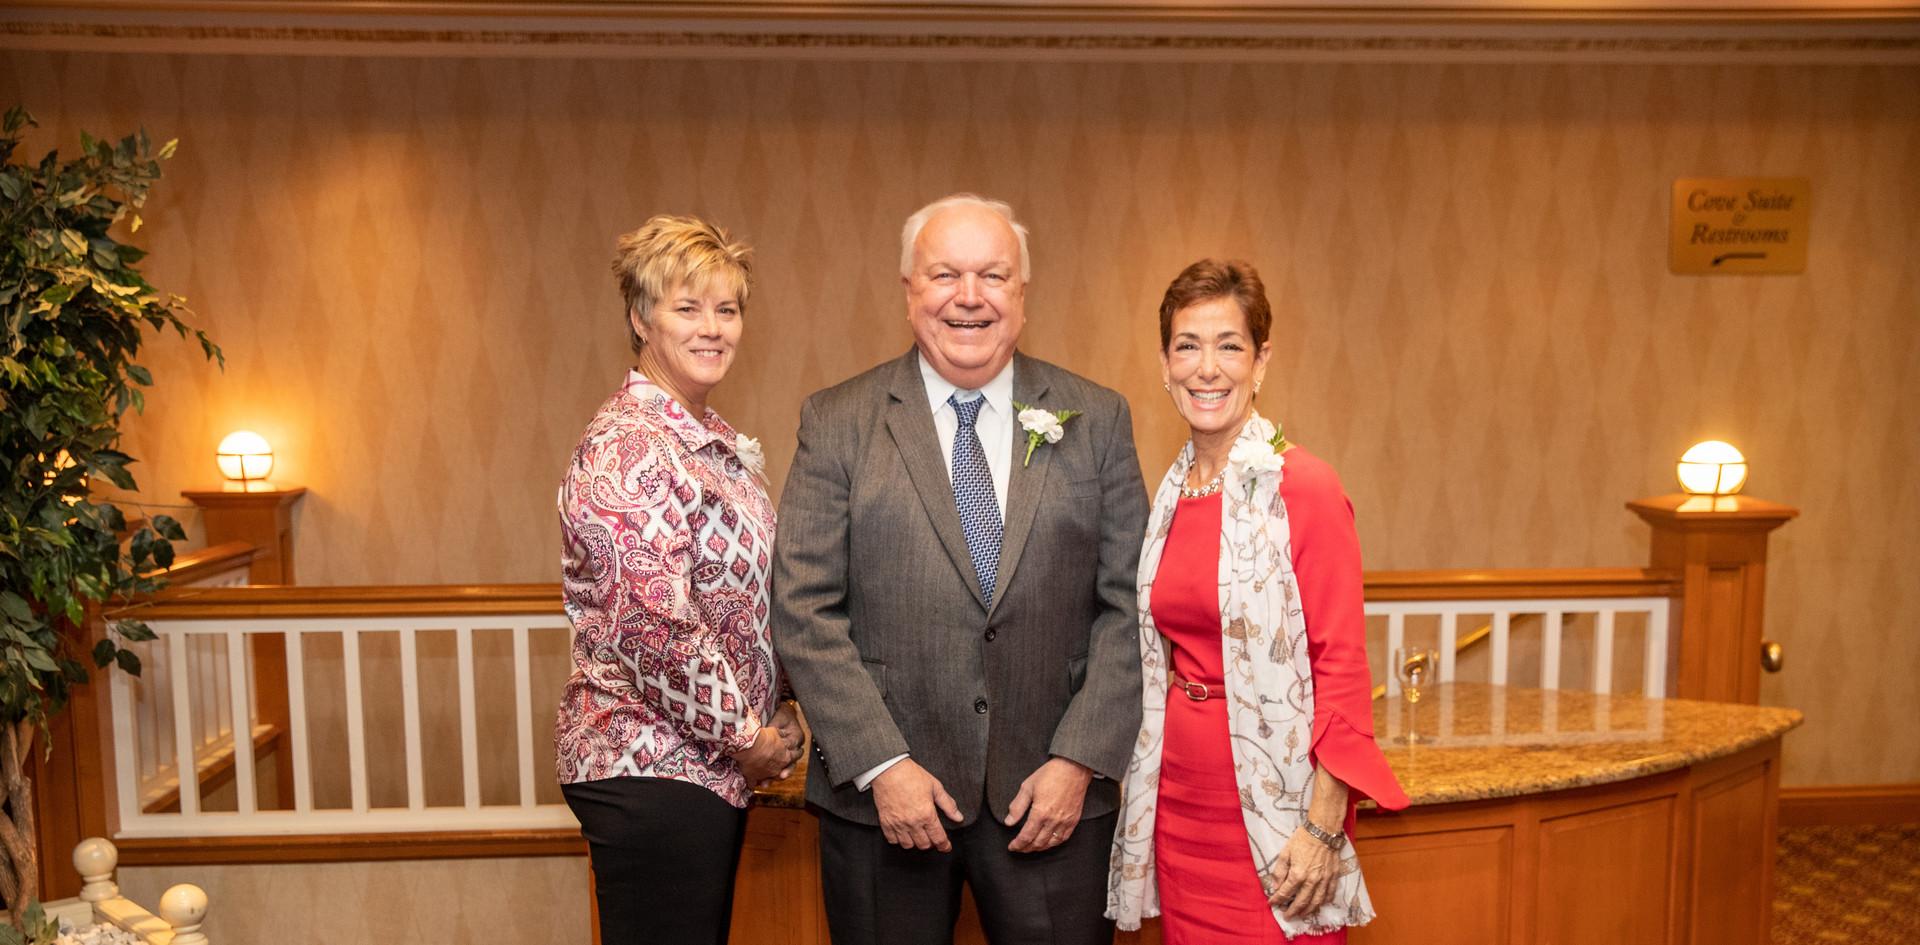 Honorees Missy Oman, Bob Kramer, and Maria Marino.  (photo by Josh Molaver)